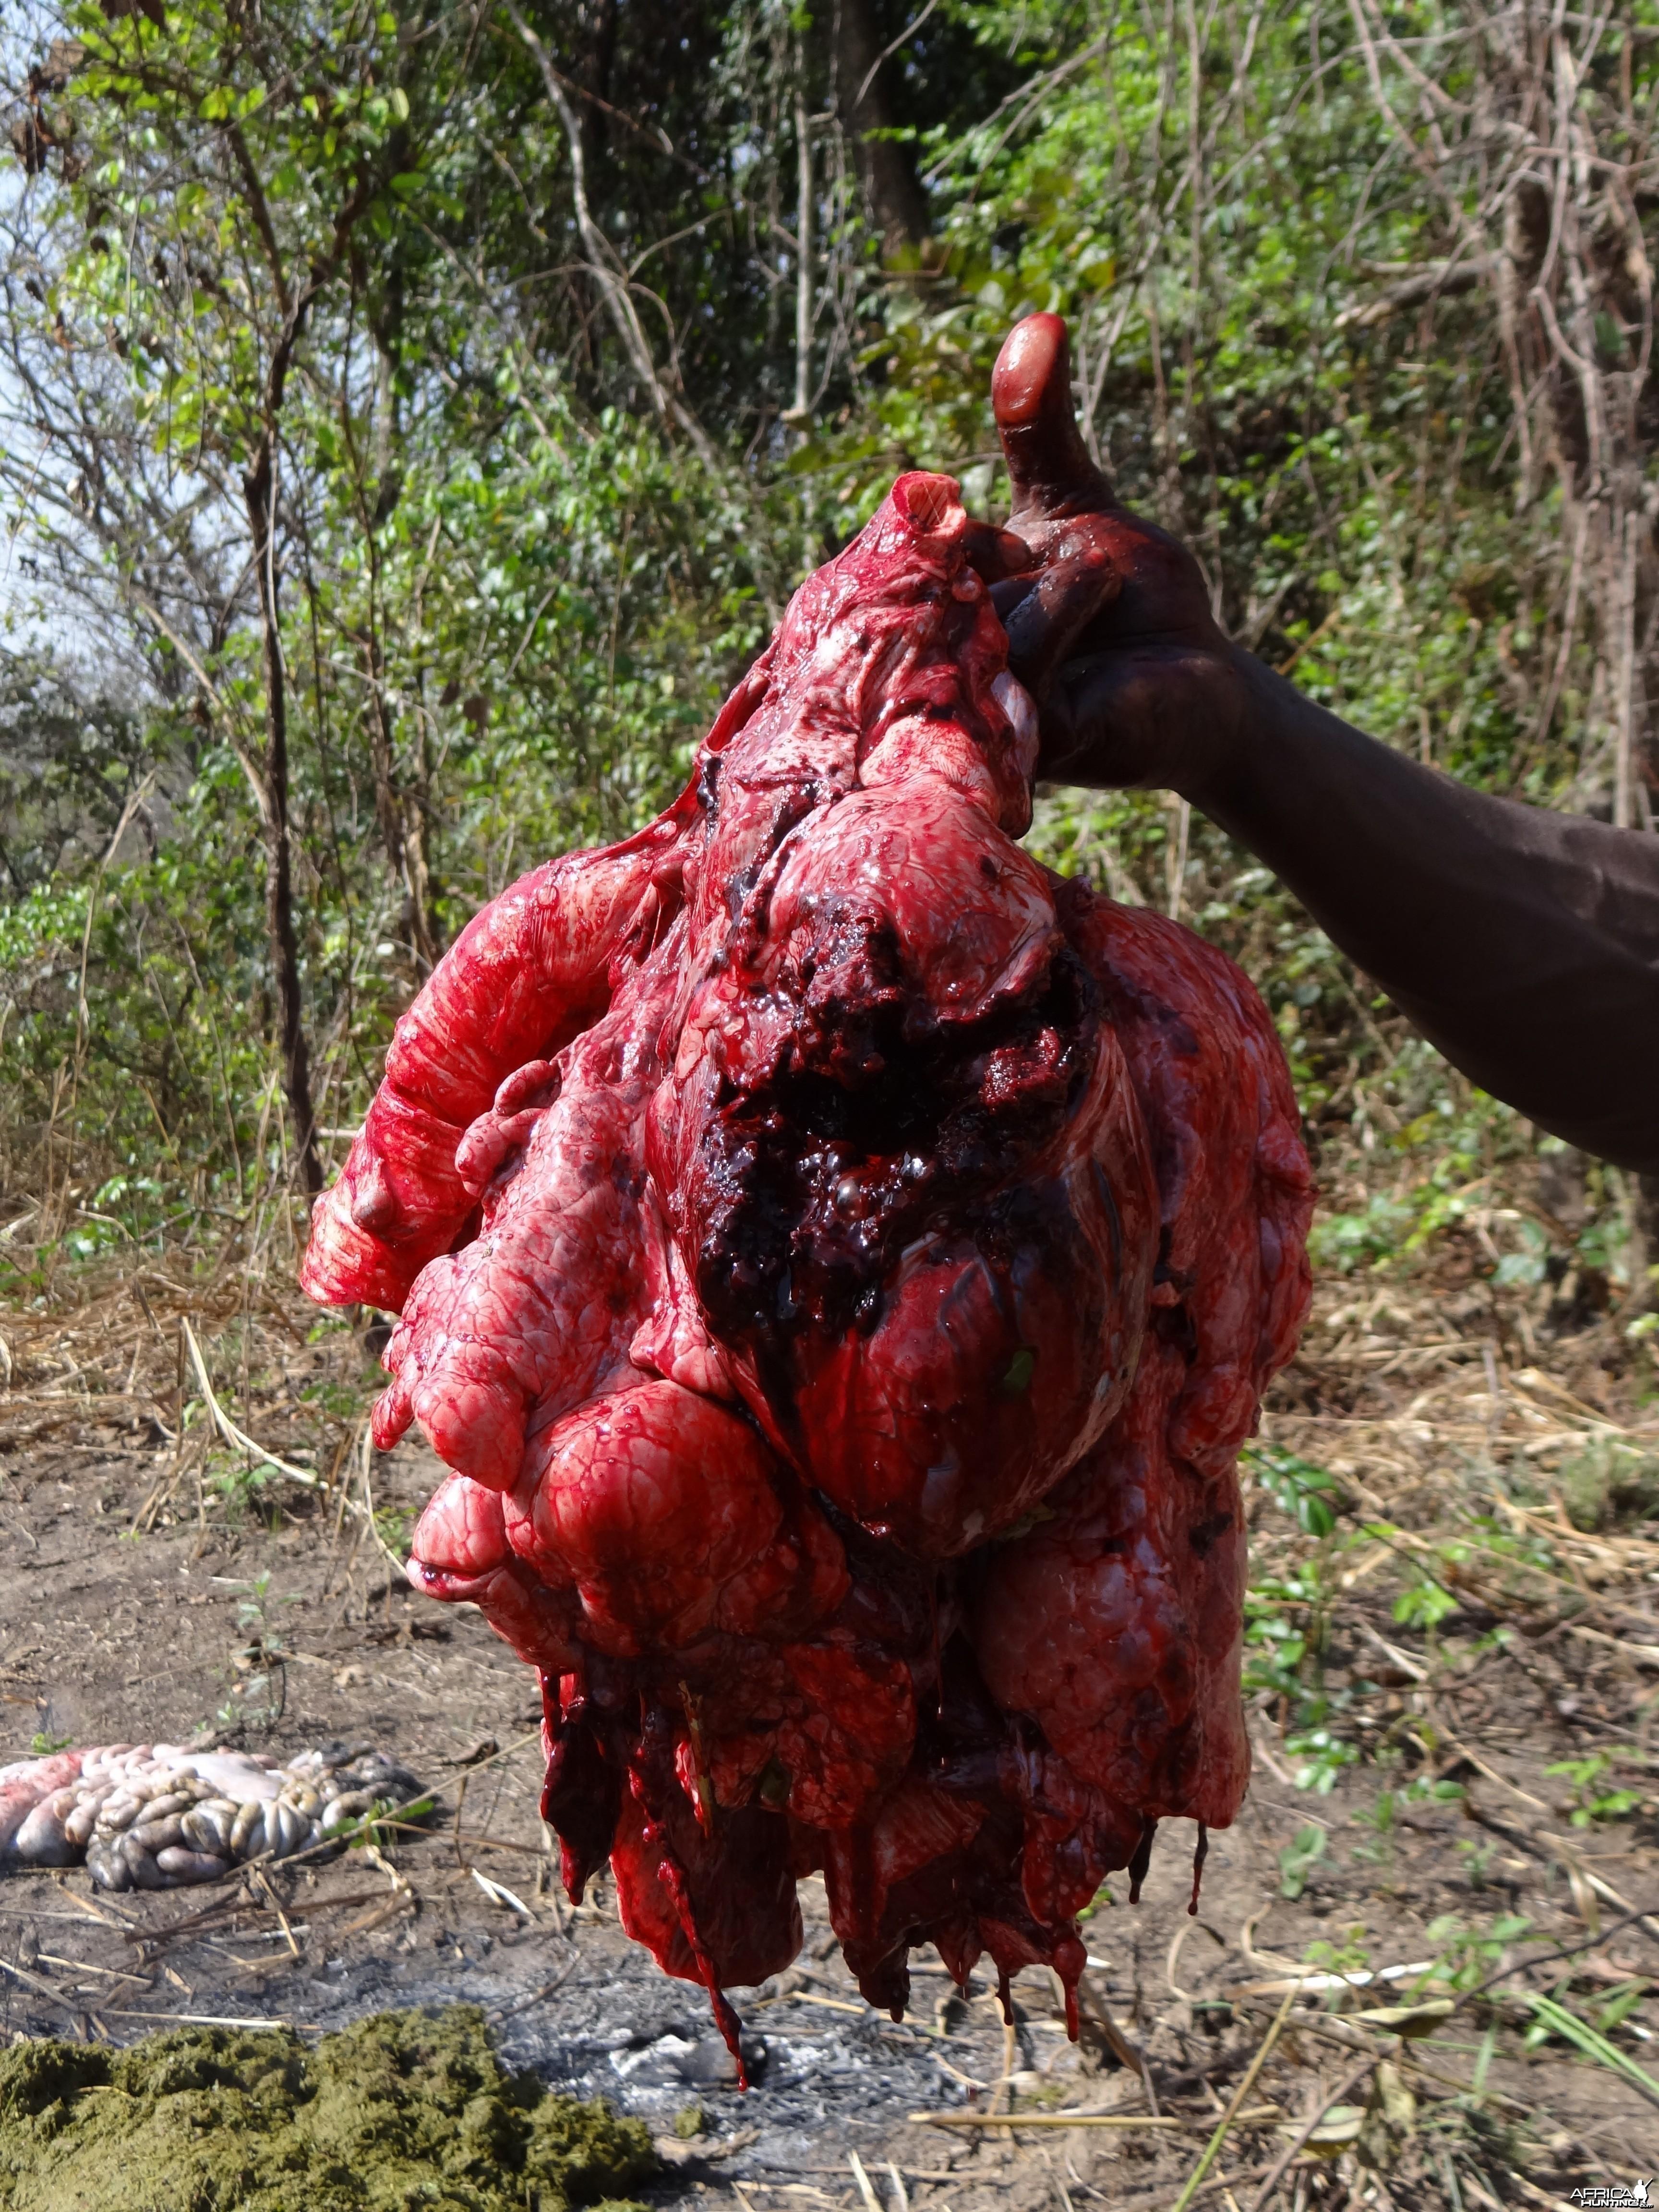 Buffalo vital organs